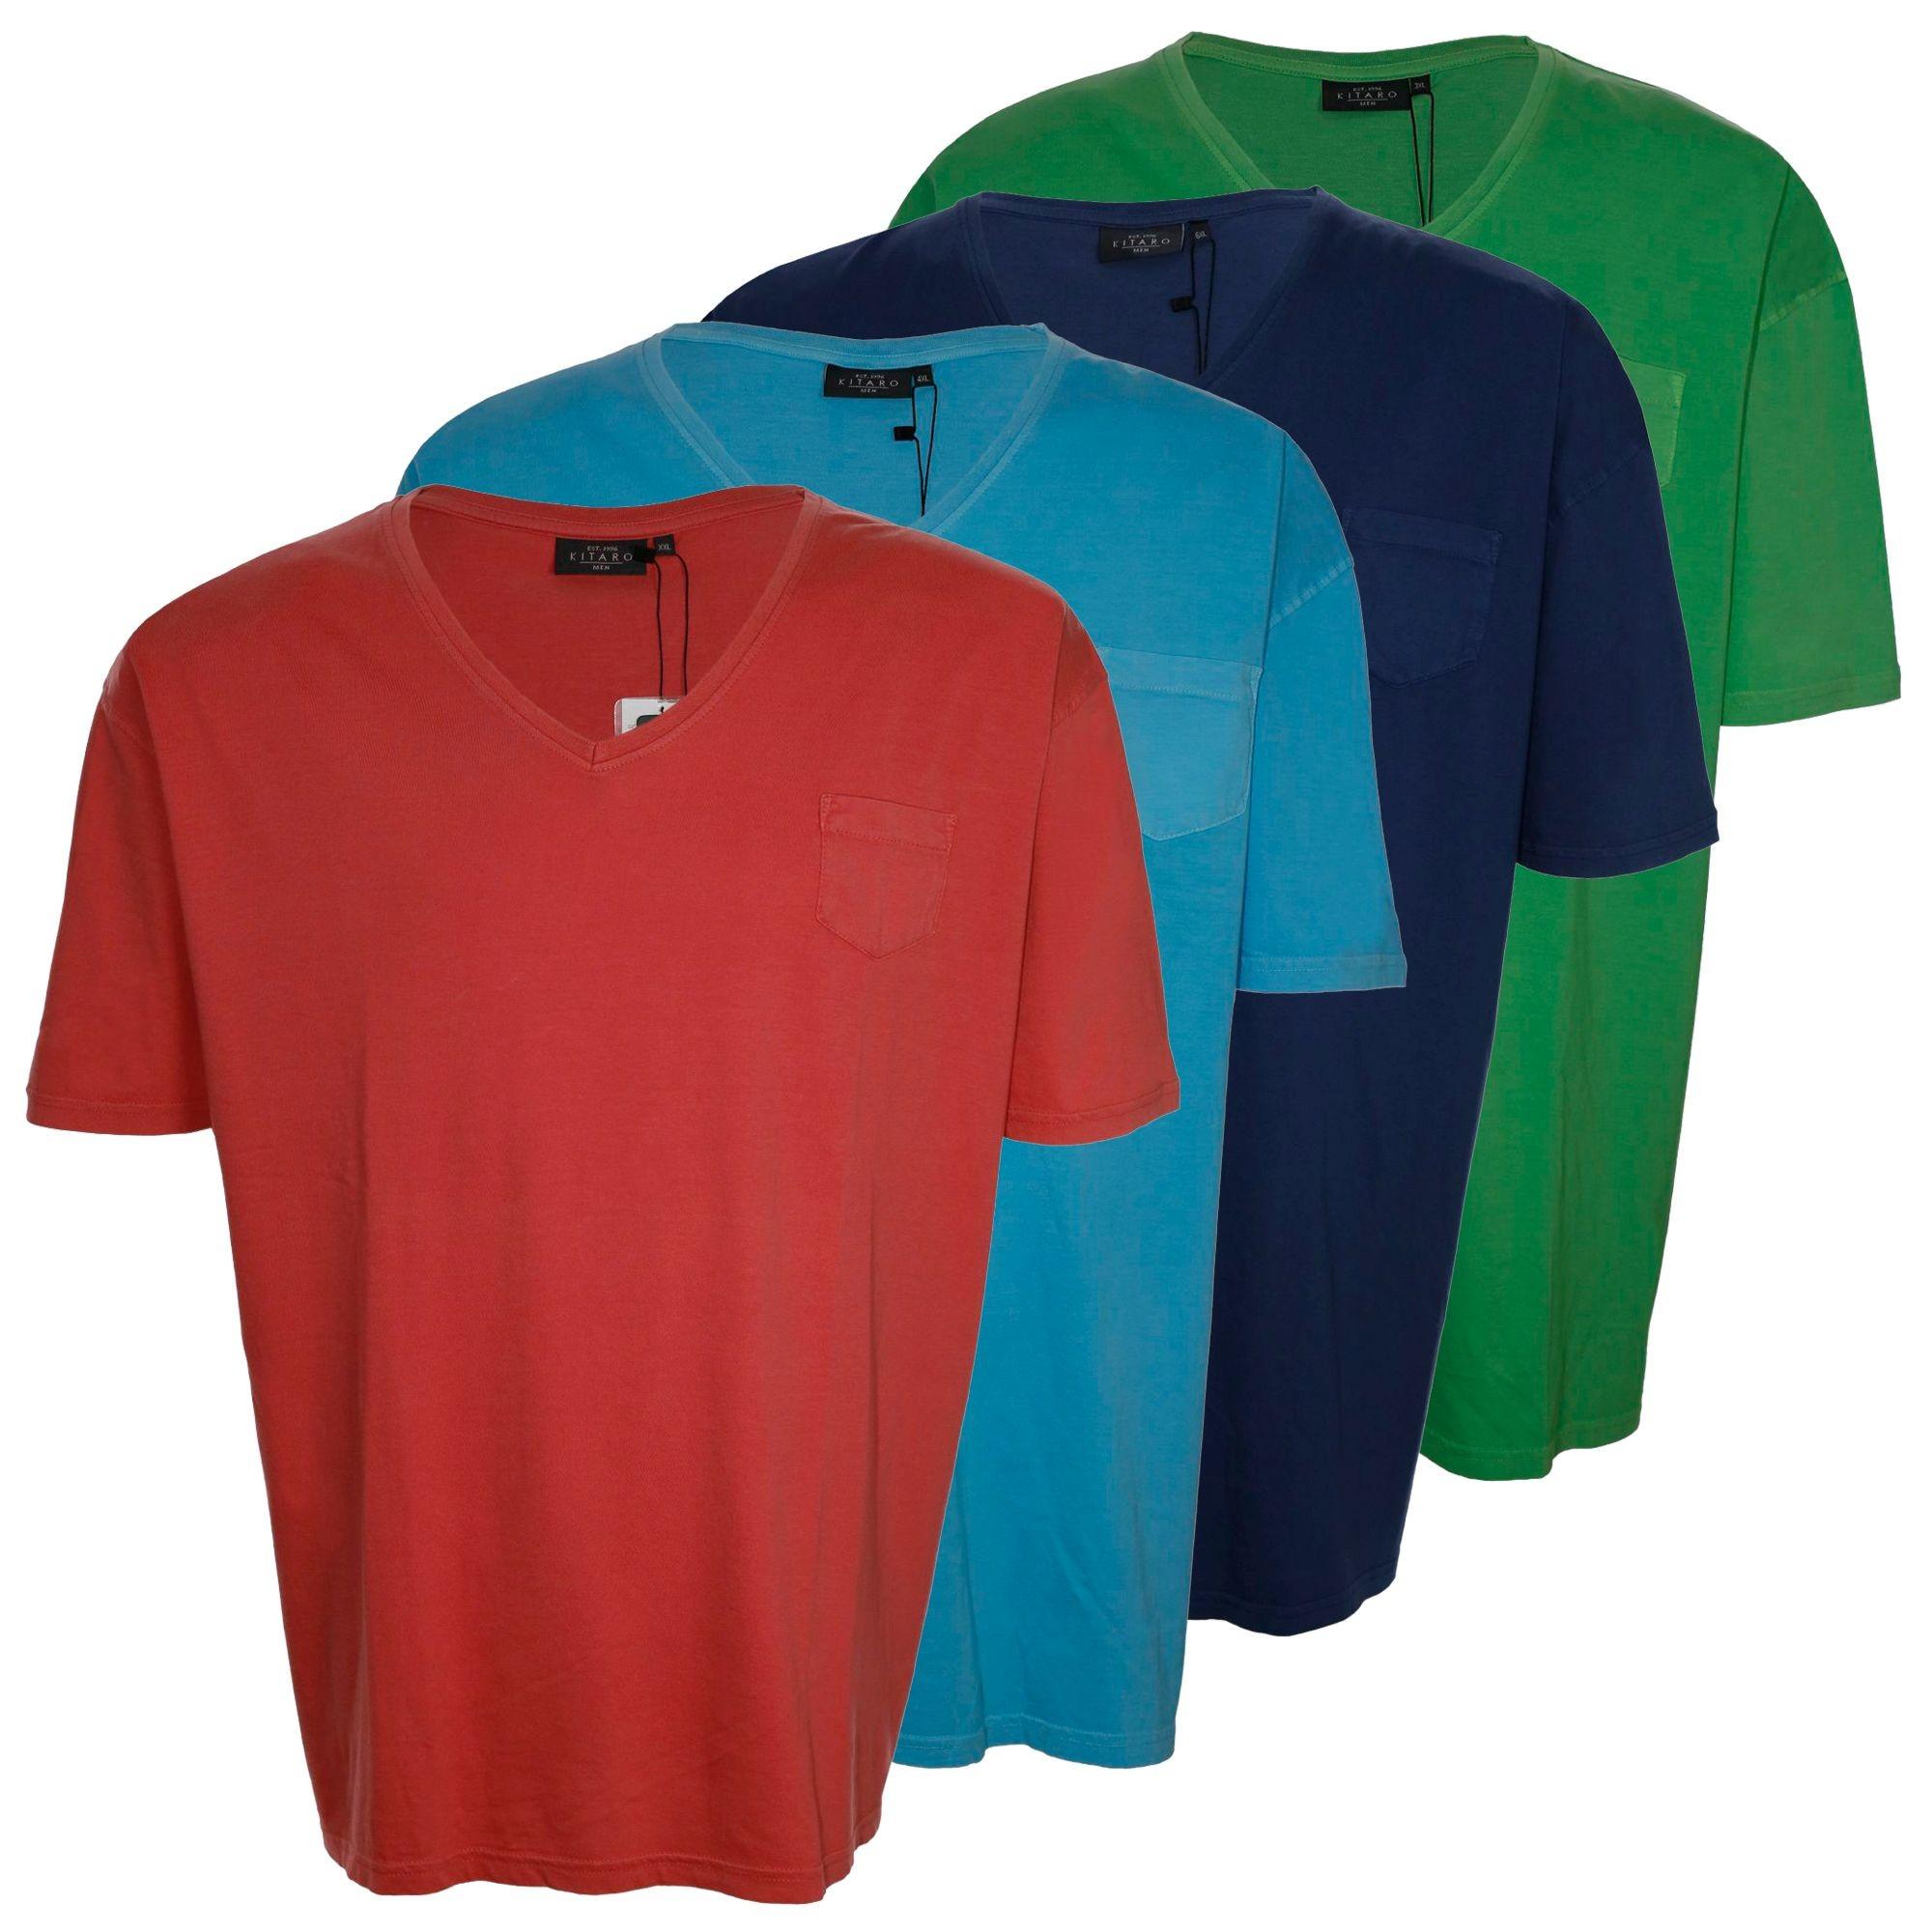 Kitaro T shirt homme manches courtes plusgröße grande taille